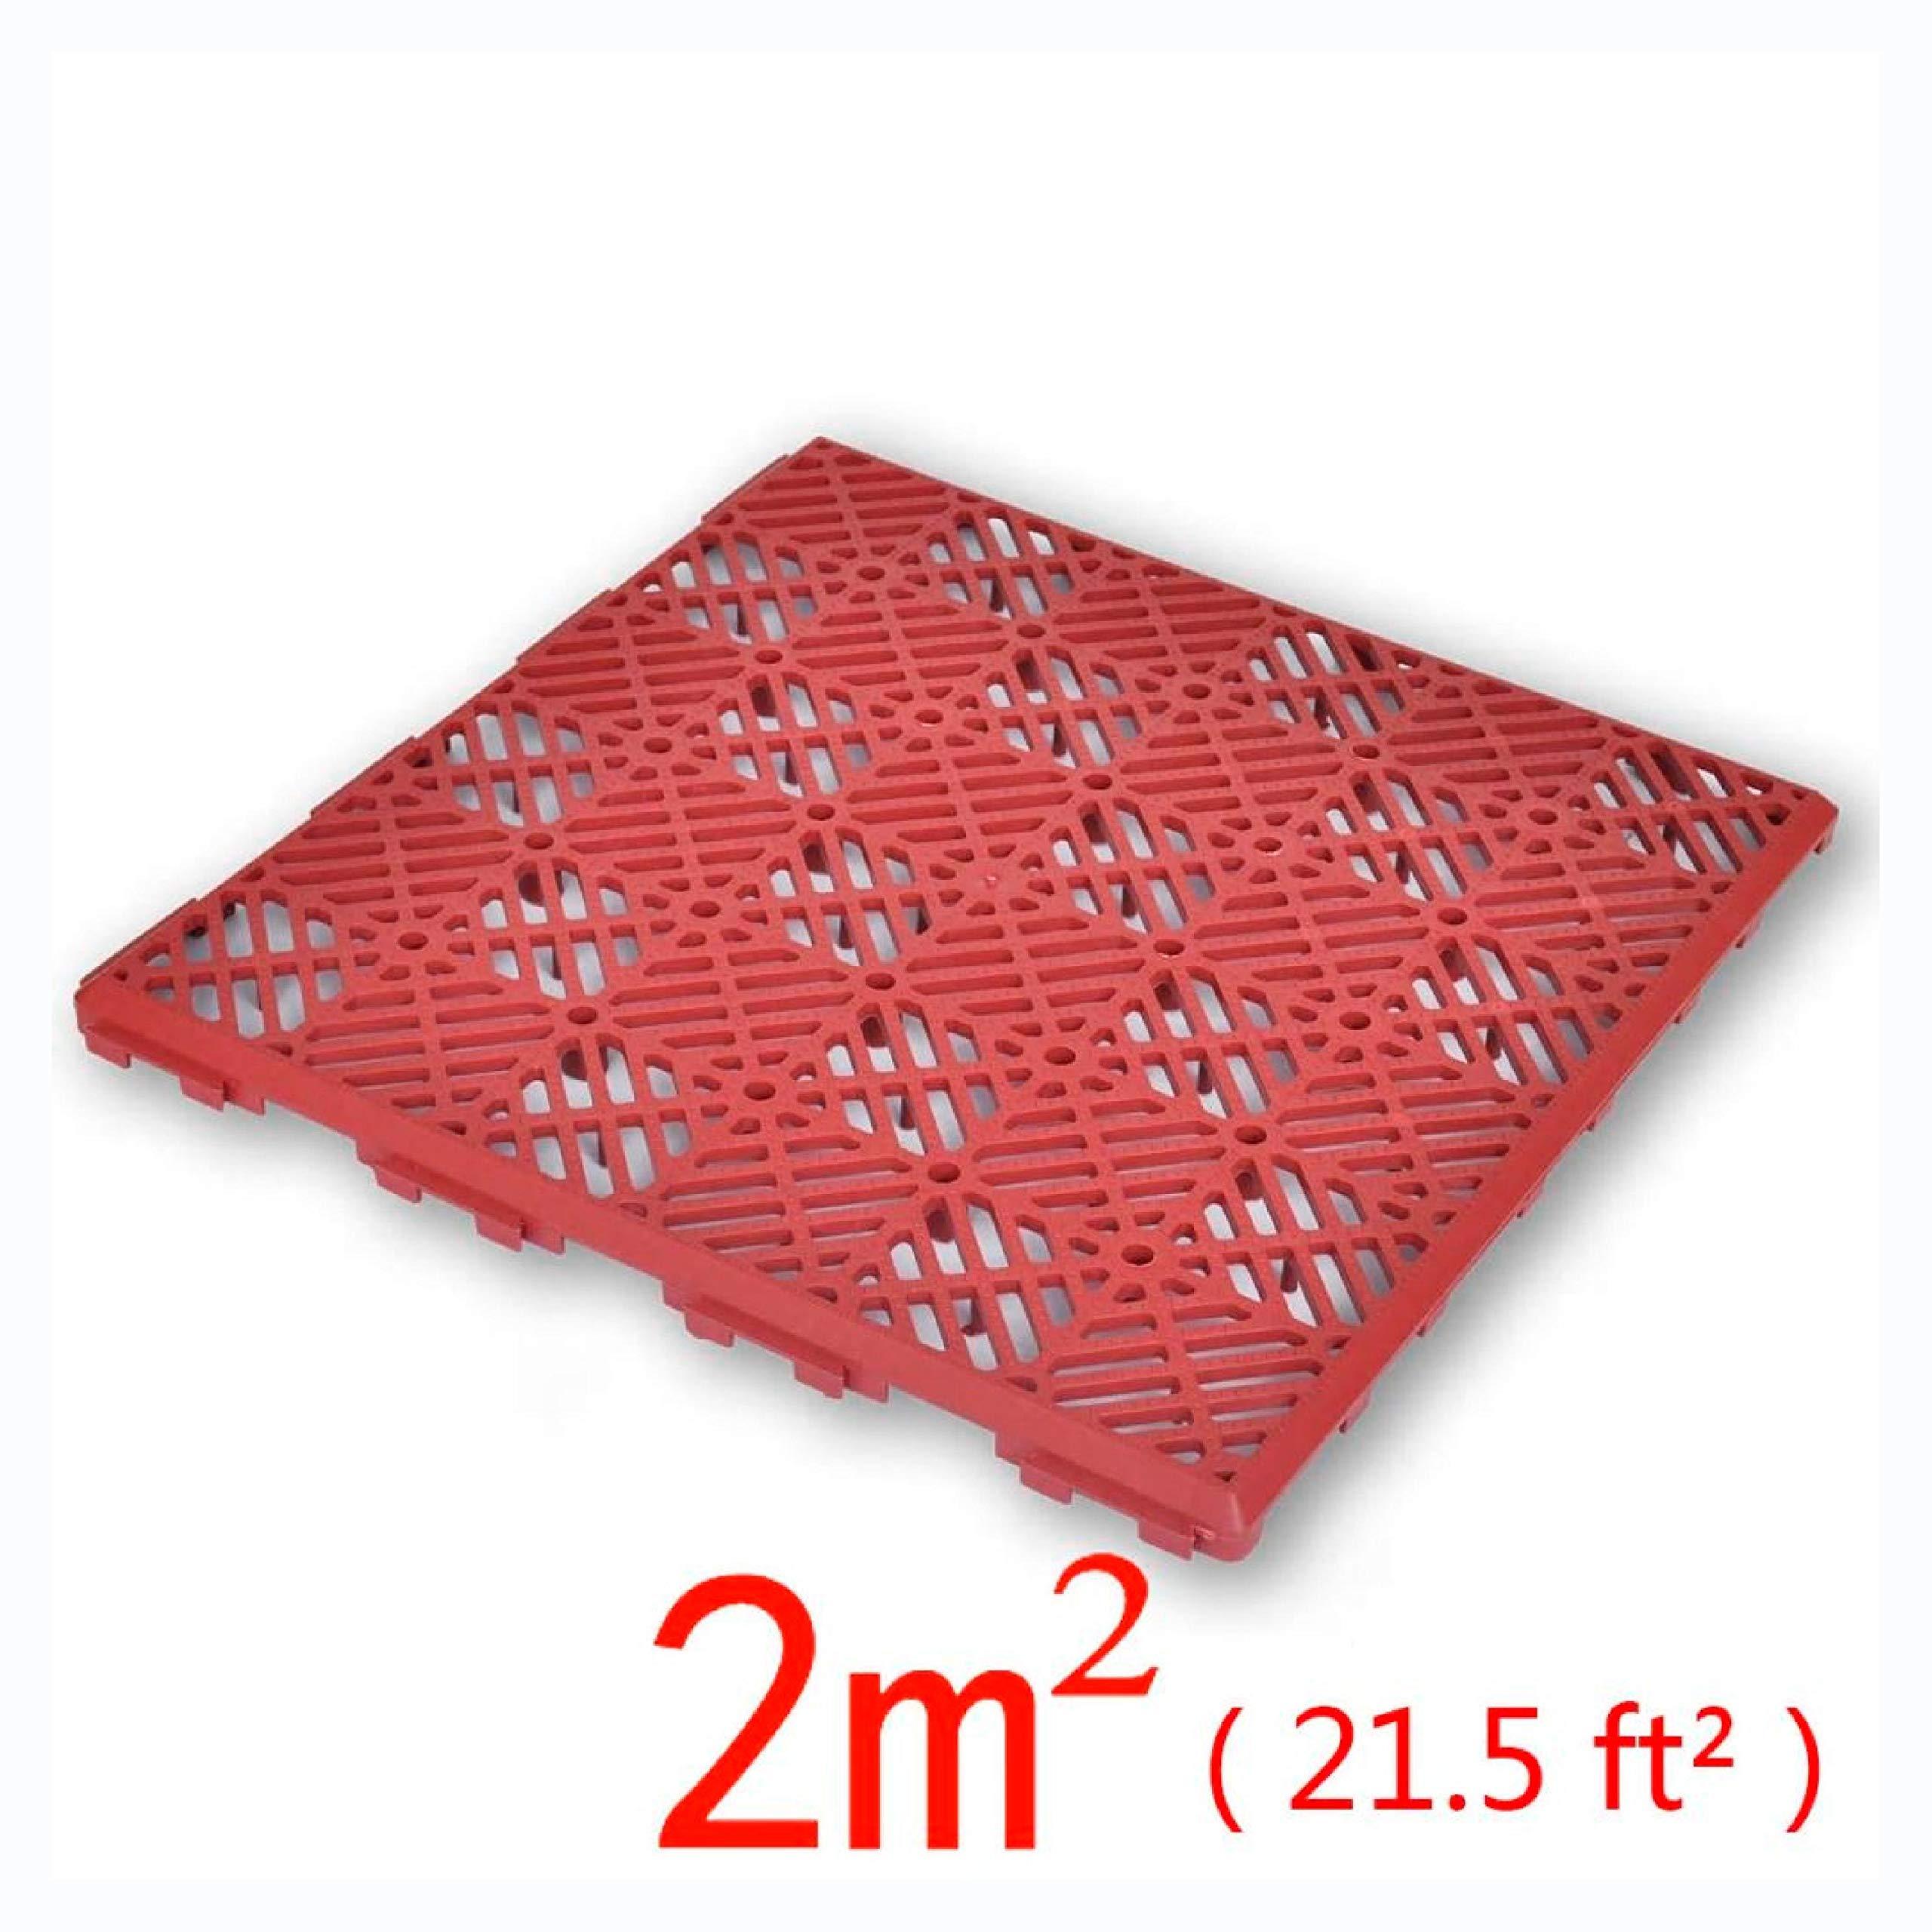 K&A Company Garden Tiles Plastic Floor Tiles 11.4''x11.4'' 24 pcs